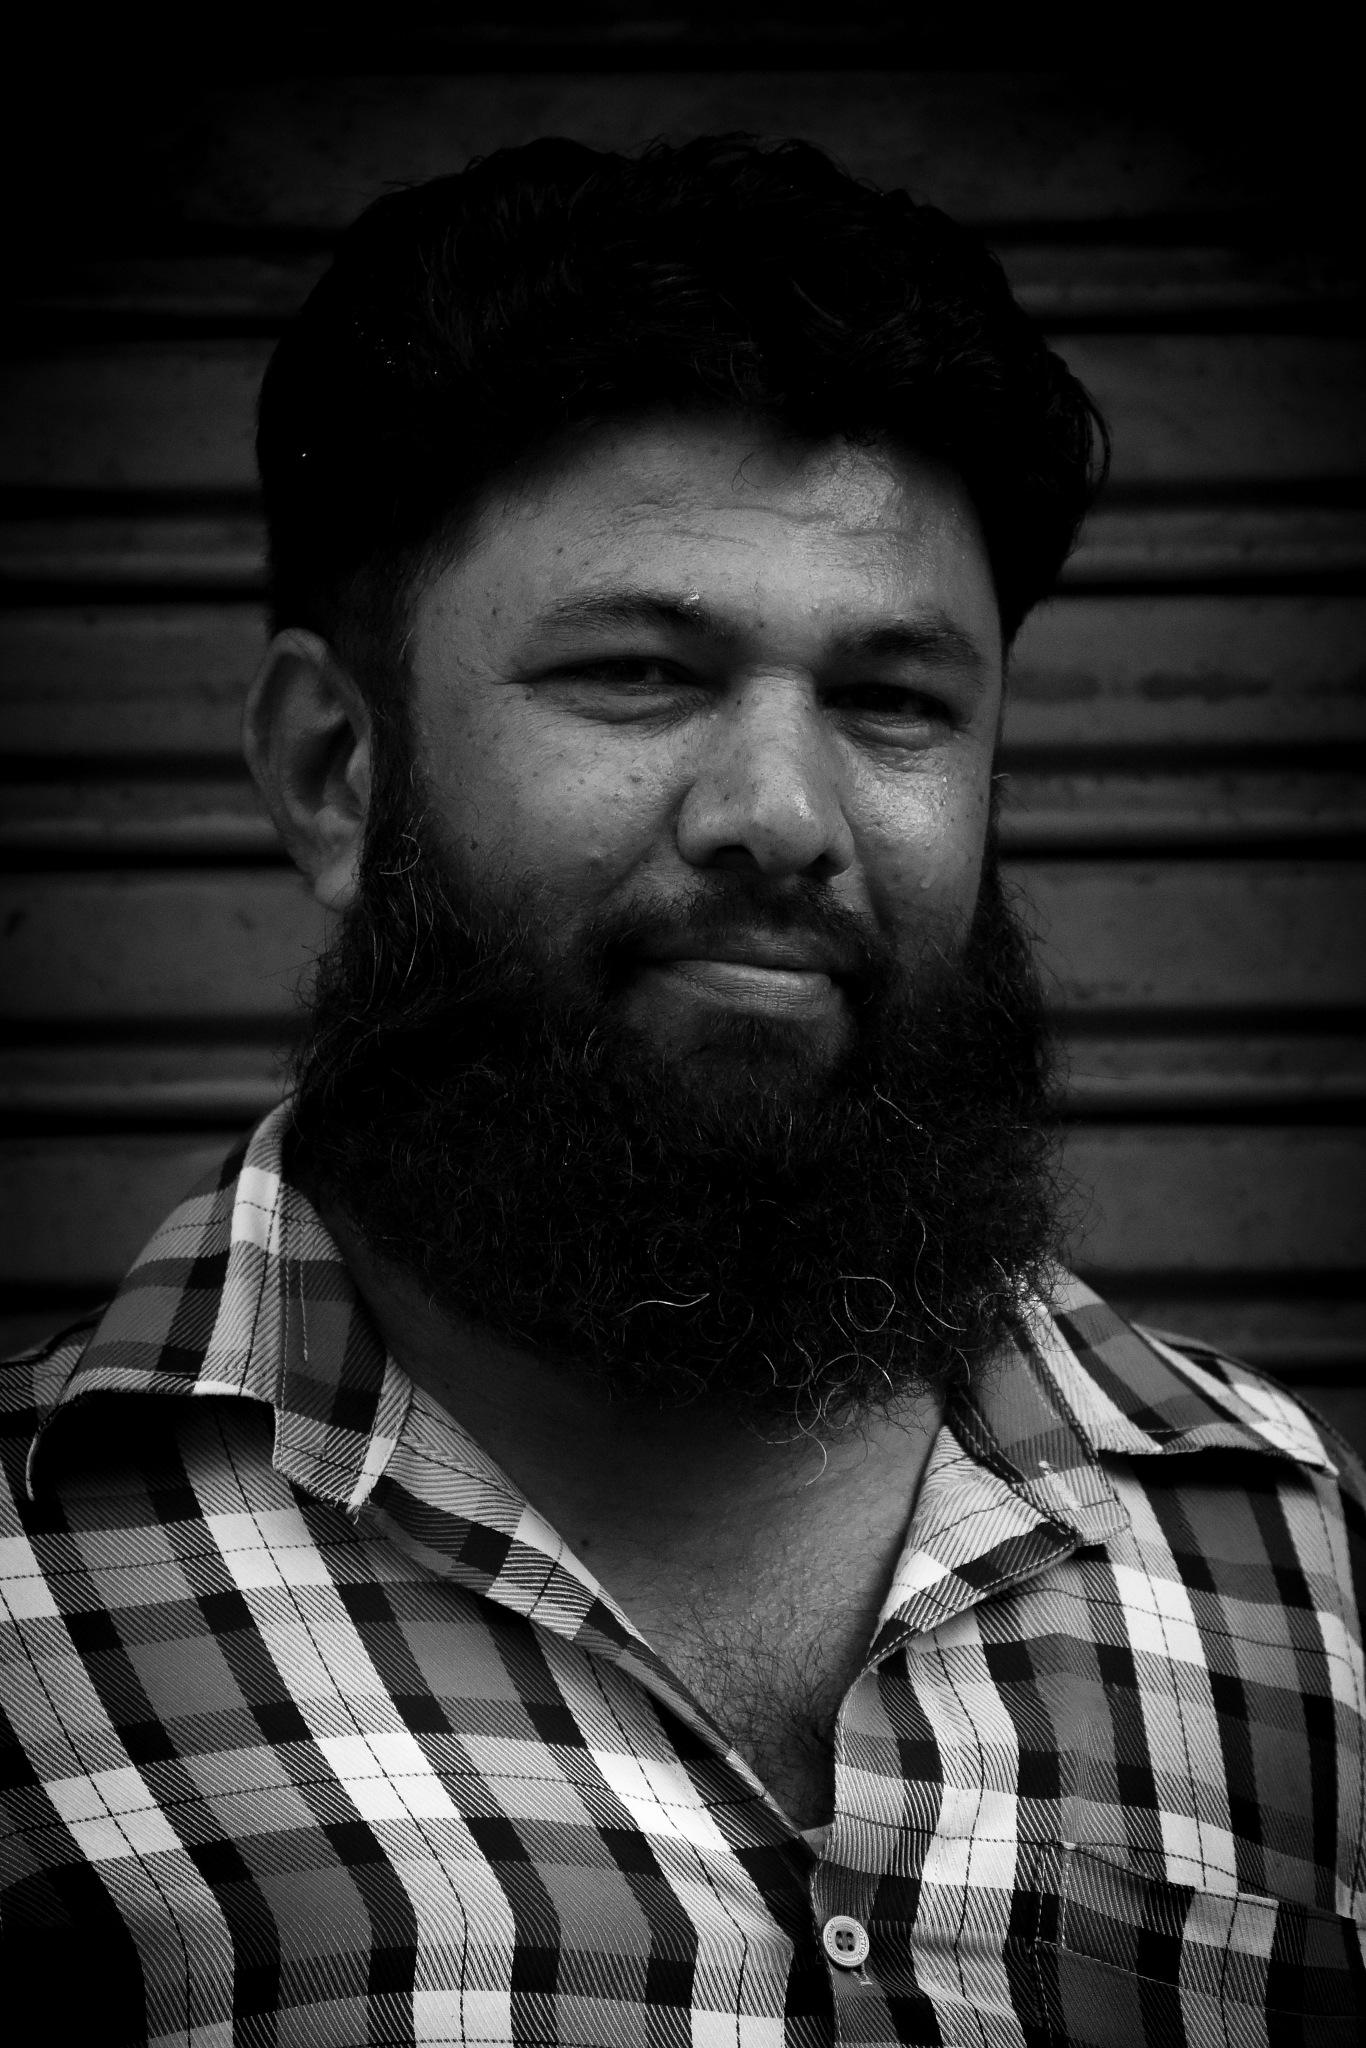 beard goals by Harsh Patel